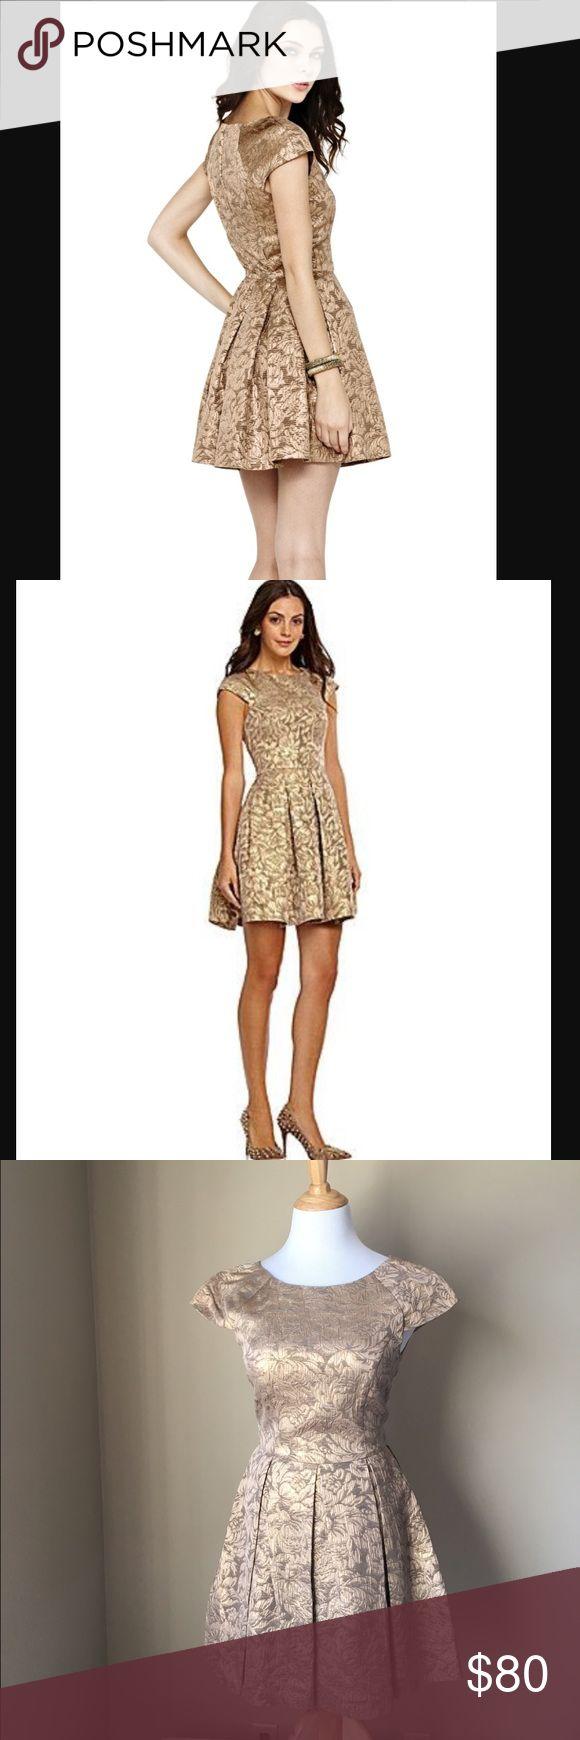 Selling this French Connection Blousy Bloom Jacquard gold dress on Poshmark! My username is: ngrano. #shopmycloset #poshmark #fashion #shopping #style #forsale #French Connection #Dresses & Skirts